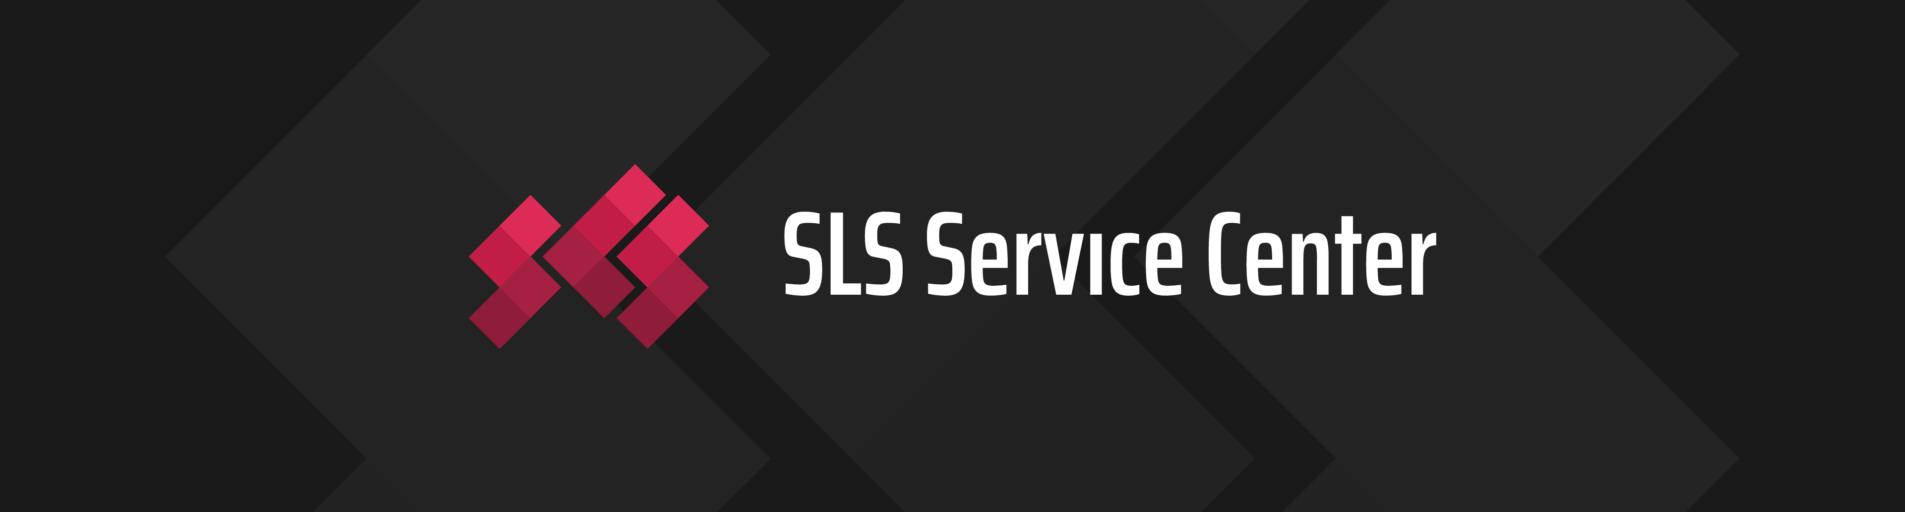 SLS Service Center